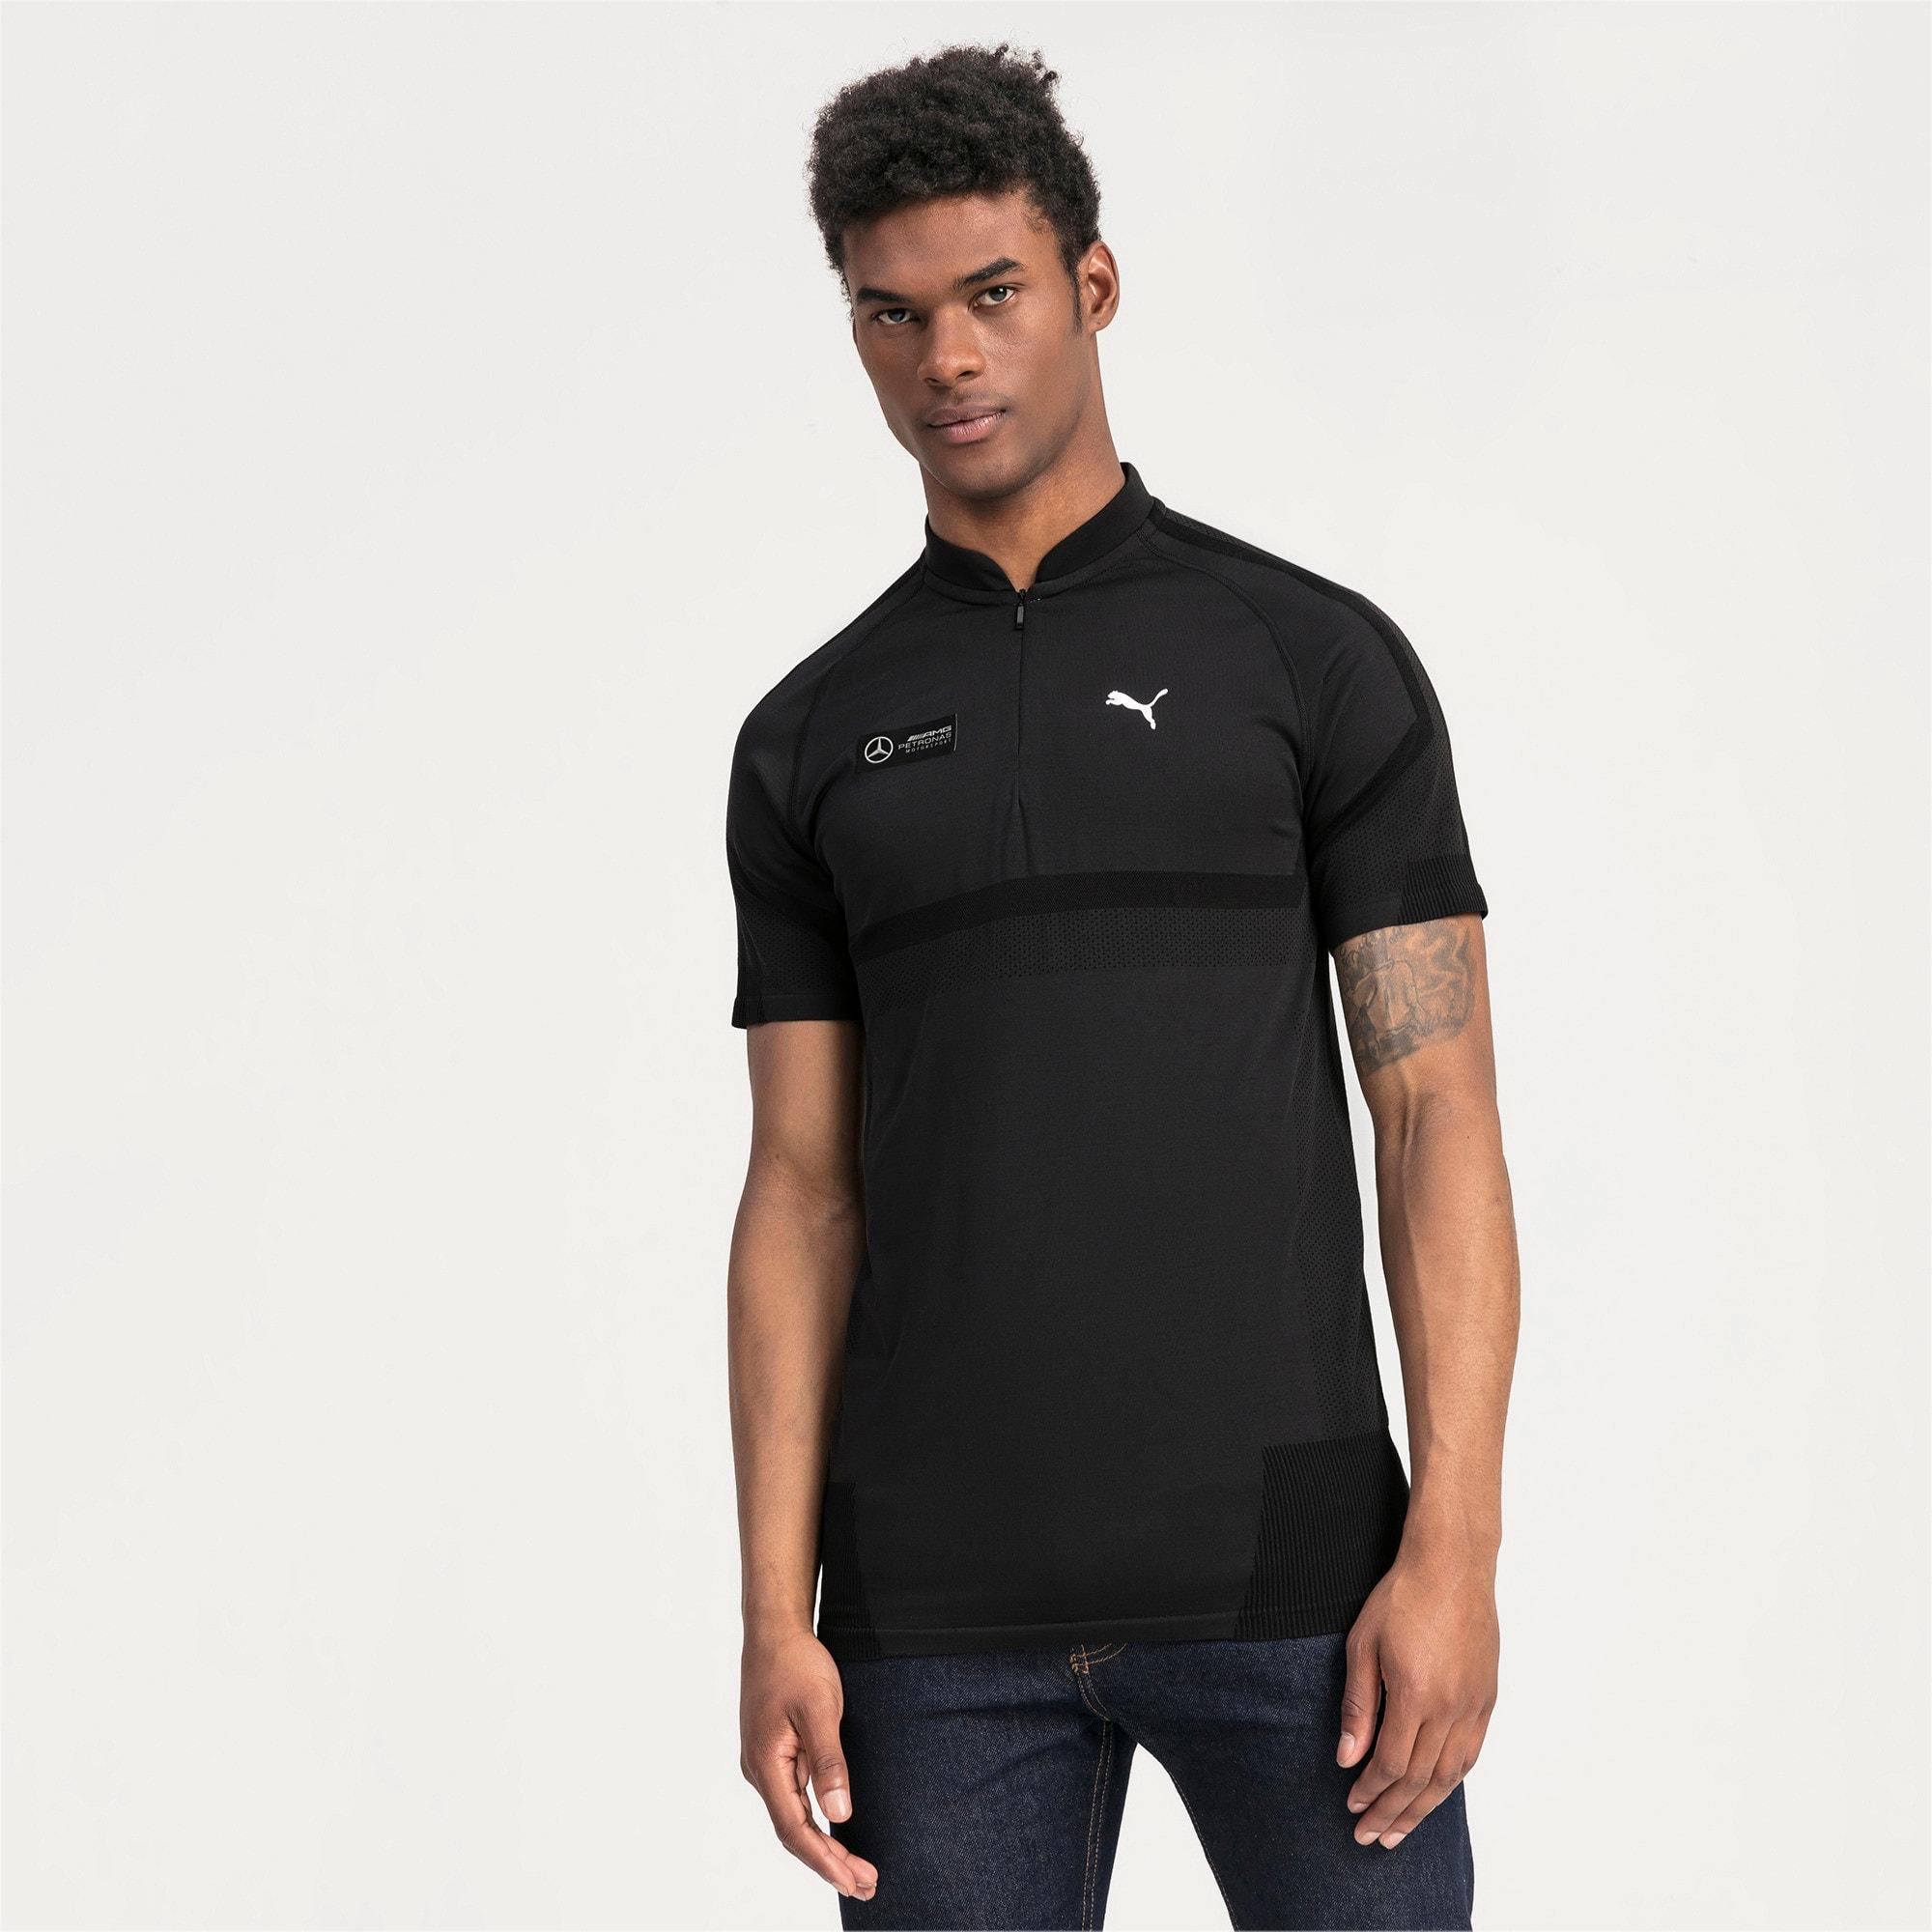 Thumbnail 1 of Mercedes AMG Petronas Men's Polo Shirt, Puma Black, medium